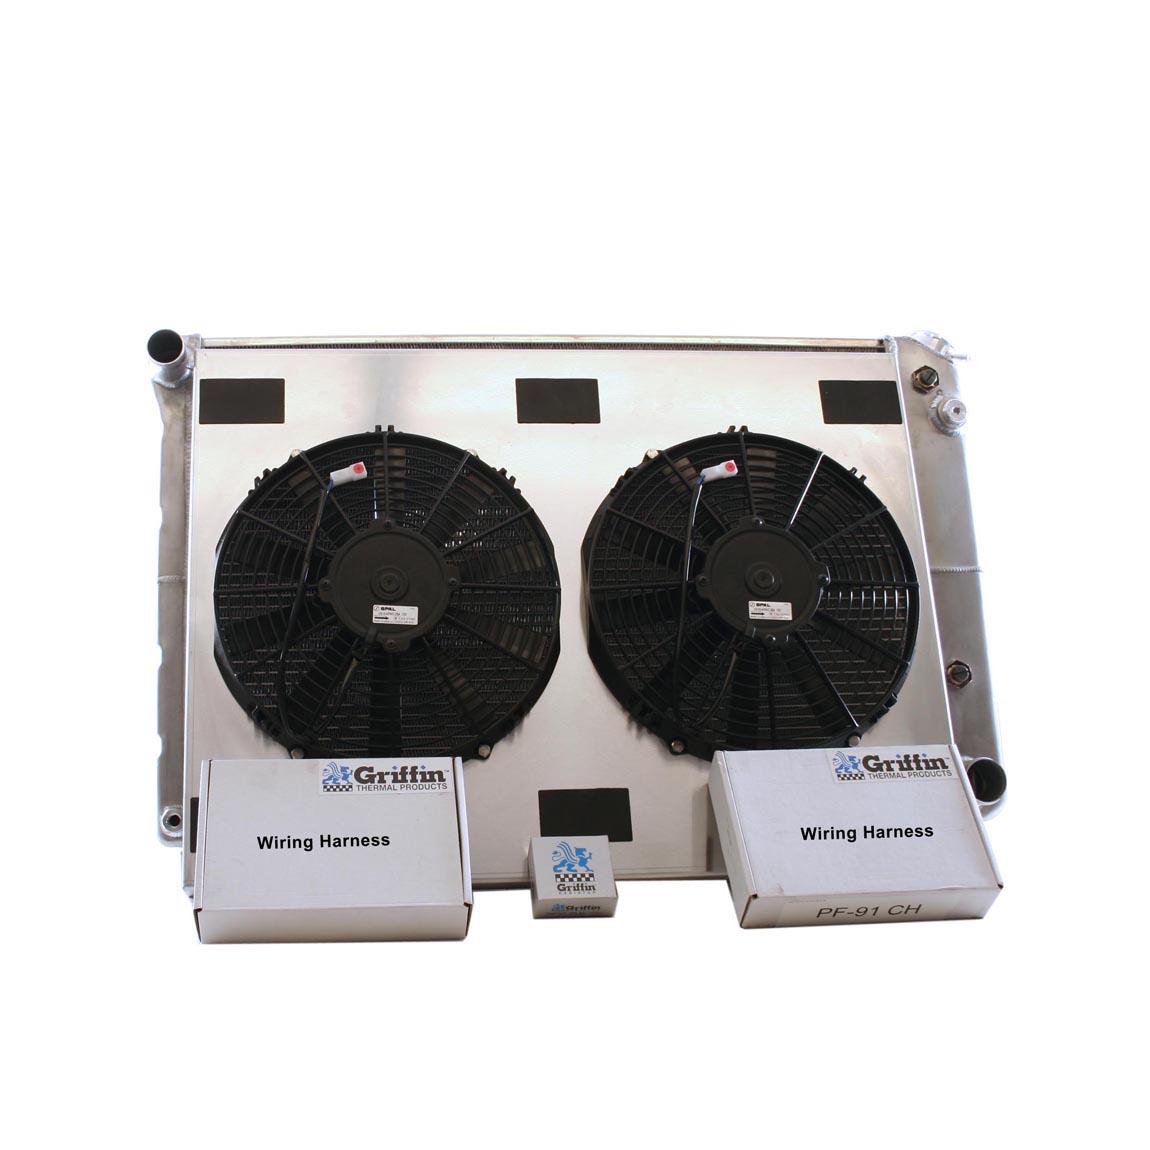 hight resolution of 1969 chevrolet scottsdale griffin aluminum radiator part number 6 70123